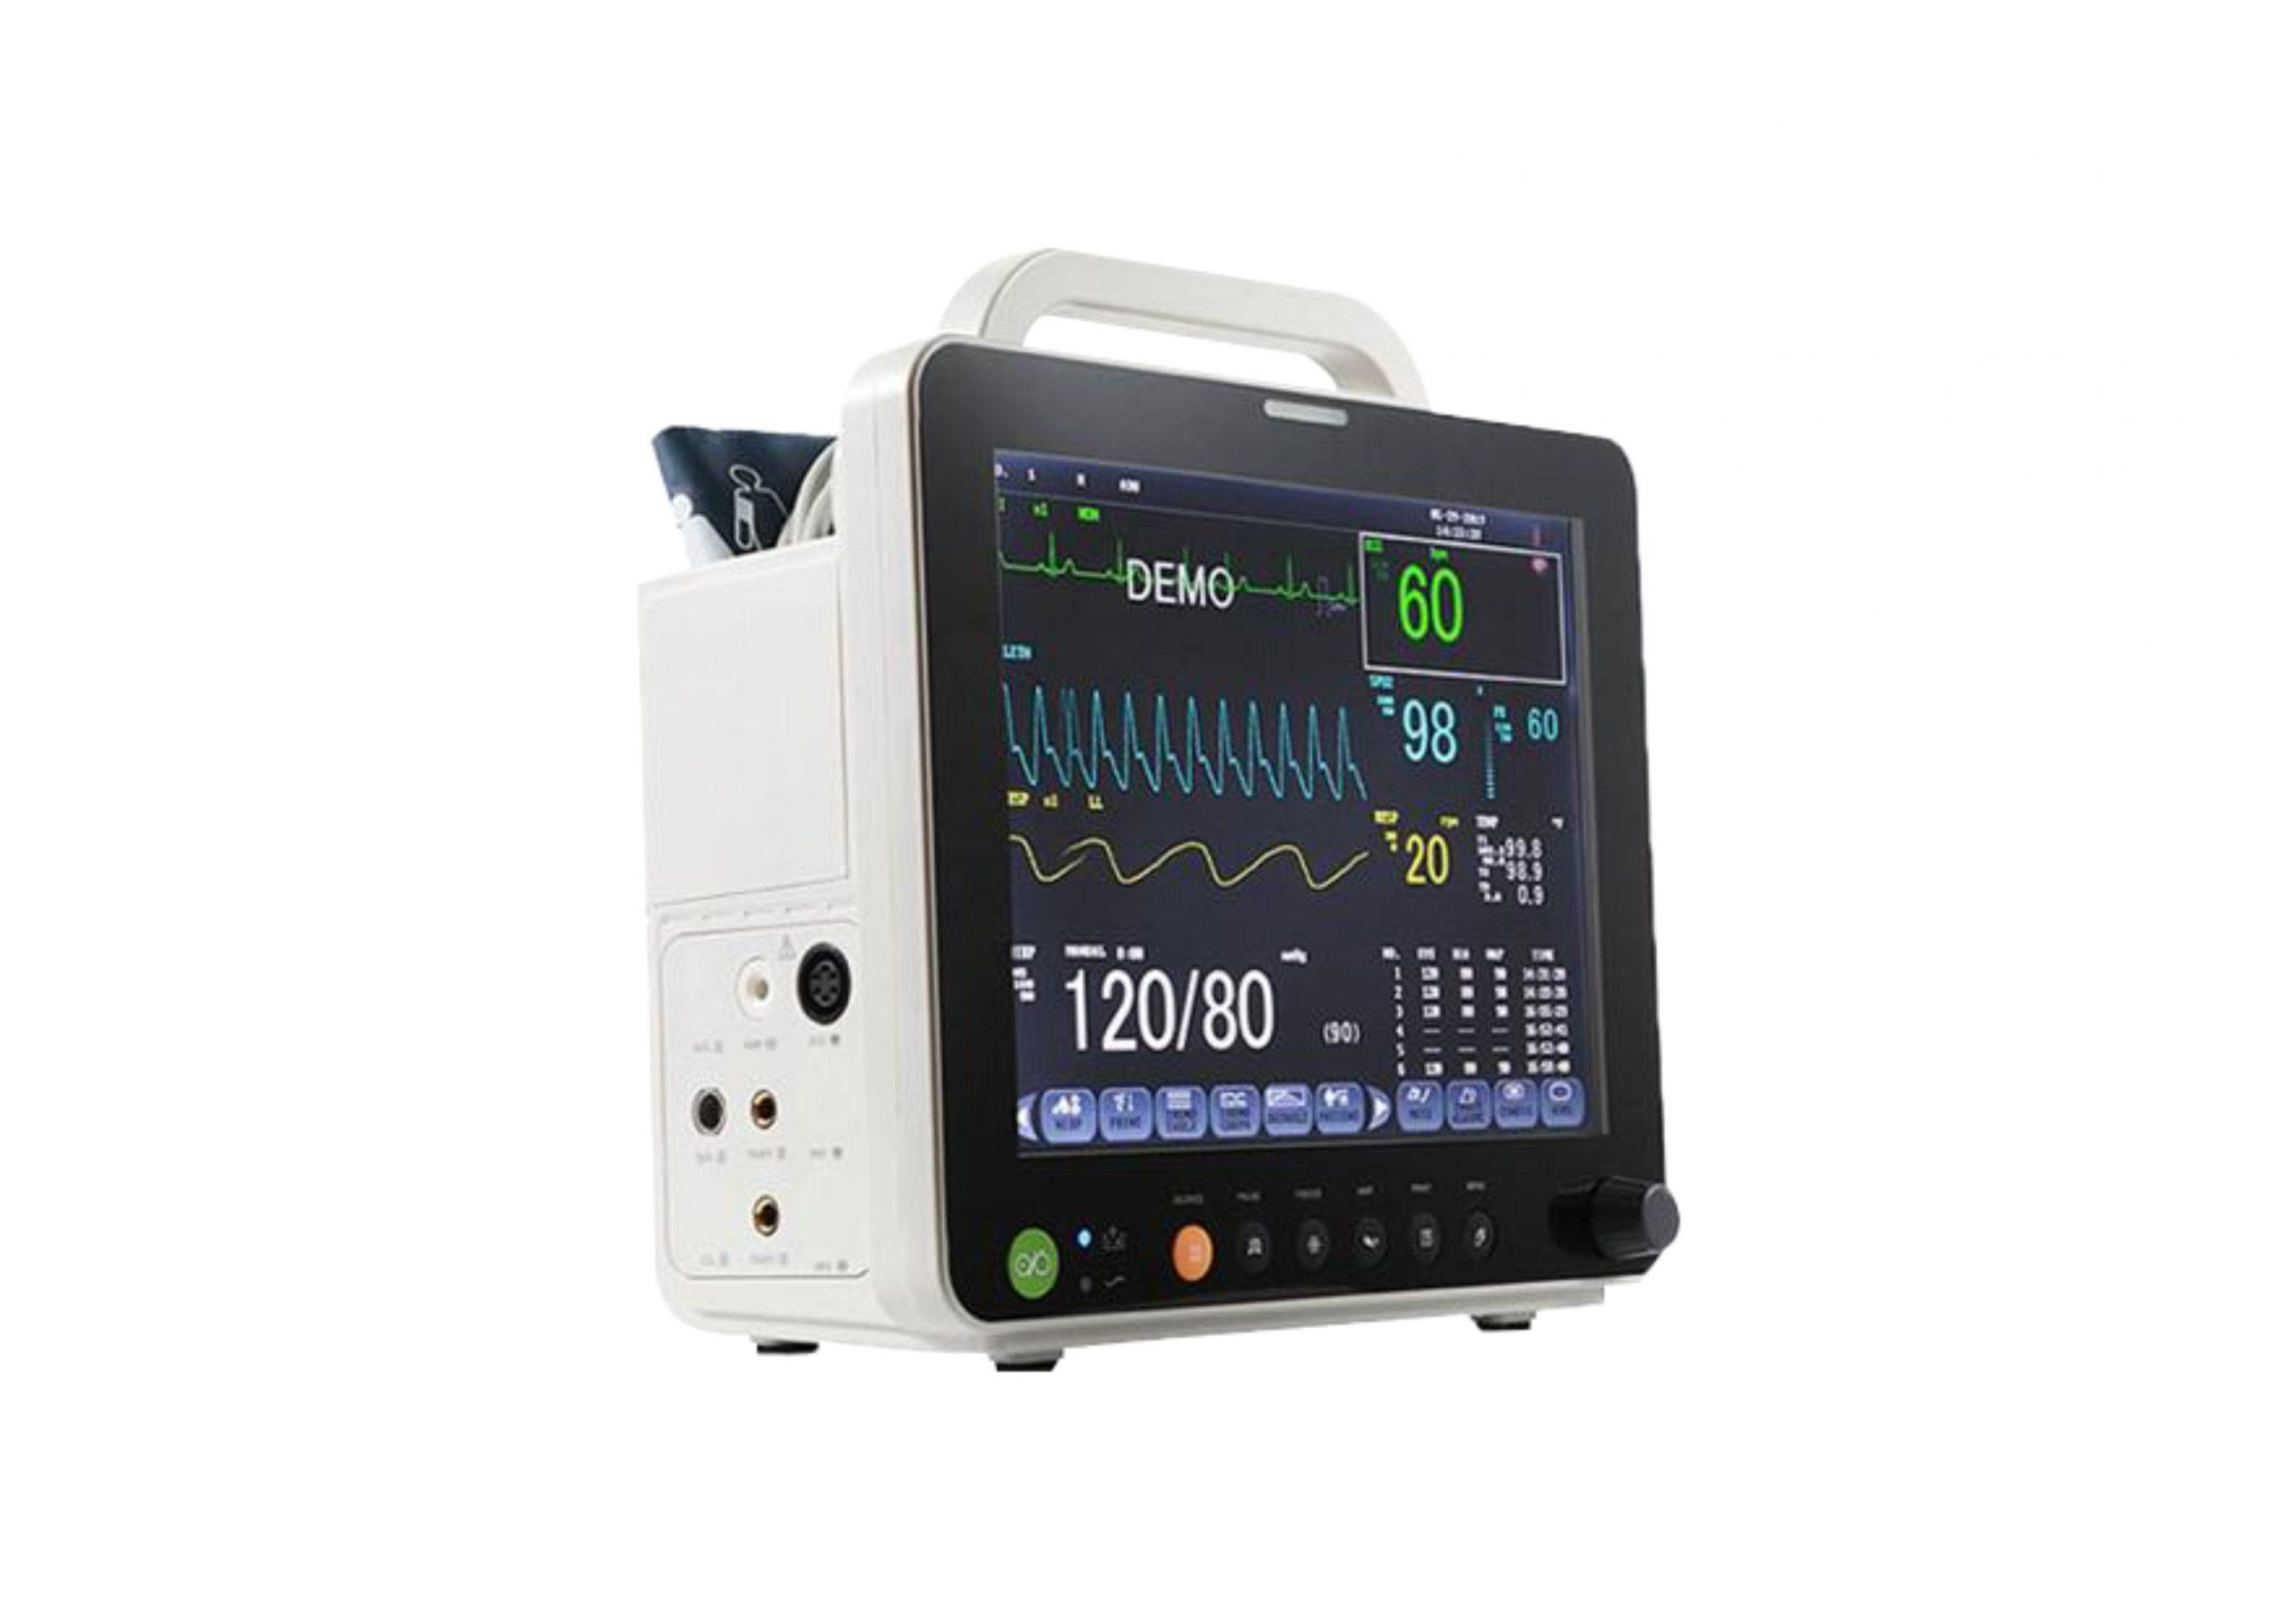 Monitor Multiparâmetro ou Monitor Cardíaco?